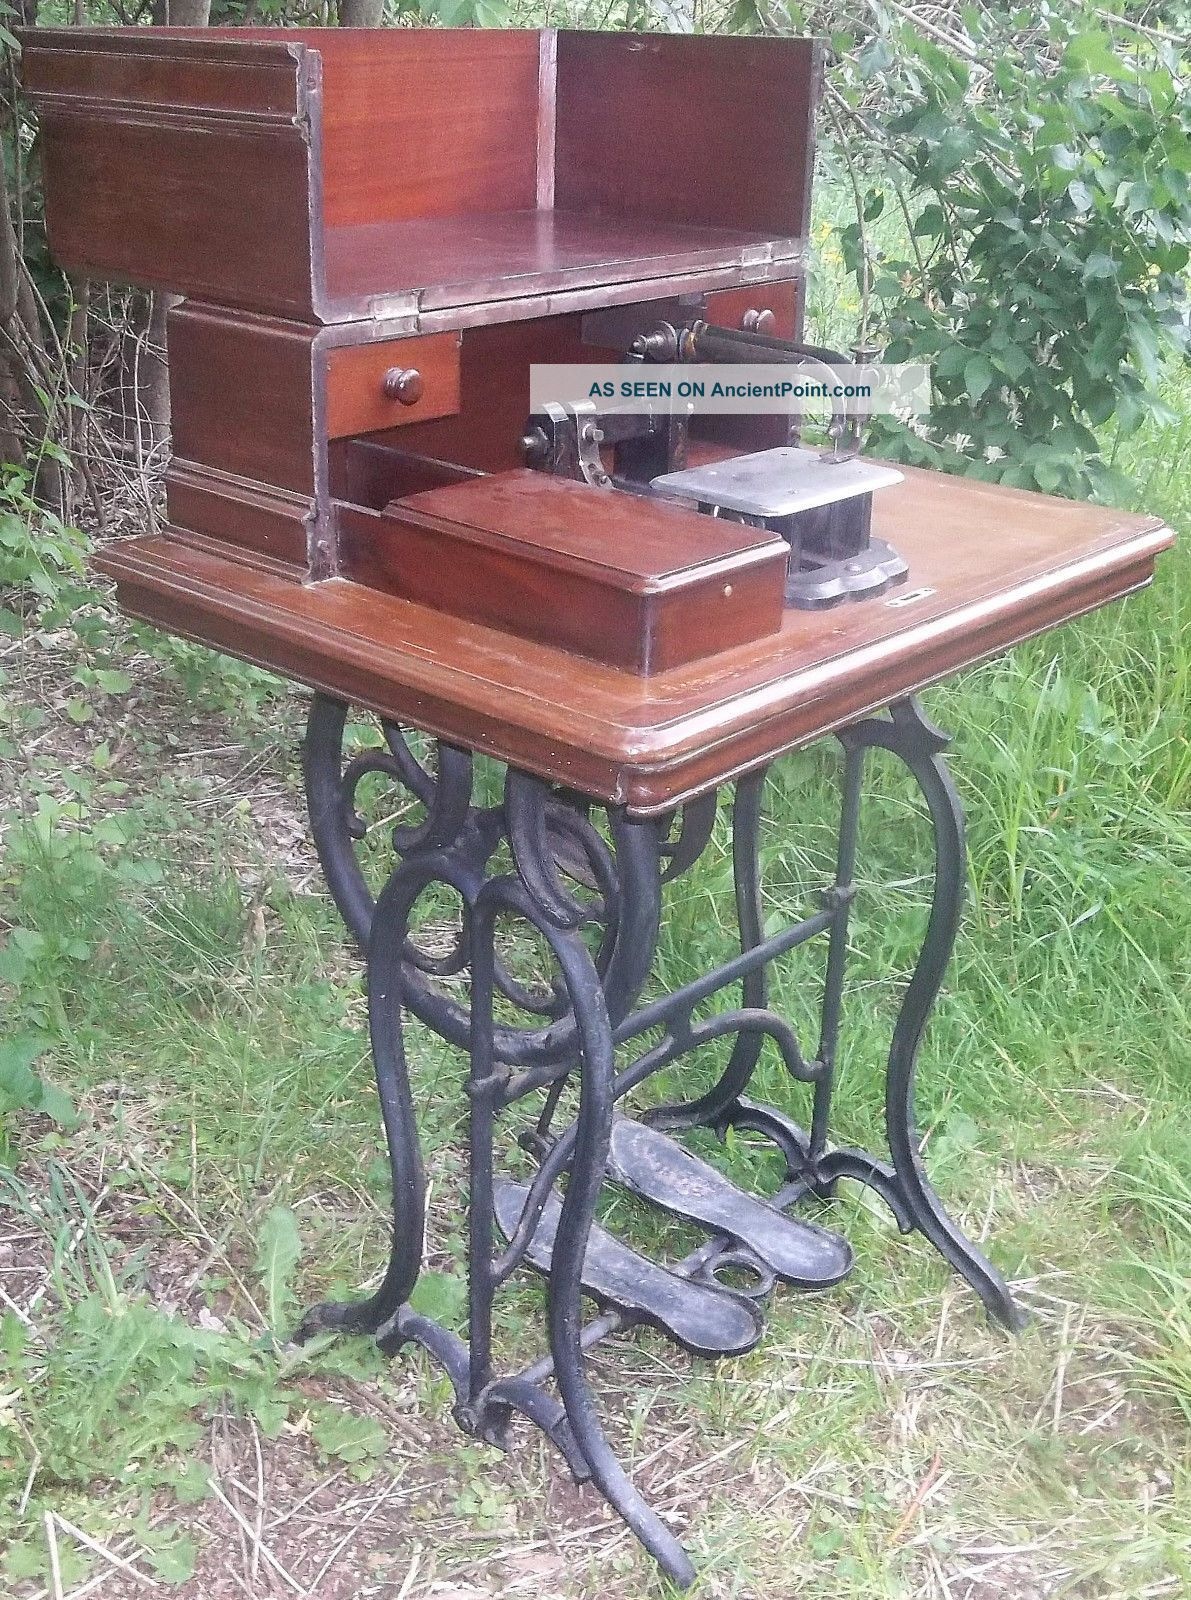 Rare & Unusual Antique 1854 Wheeler & Wilson Treadle Sewing Machine Sewing Machines photo